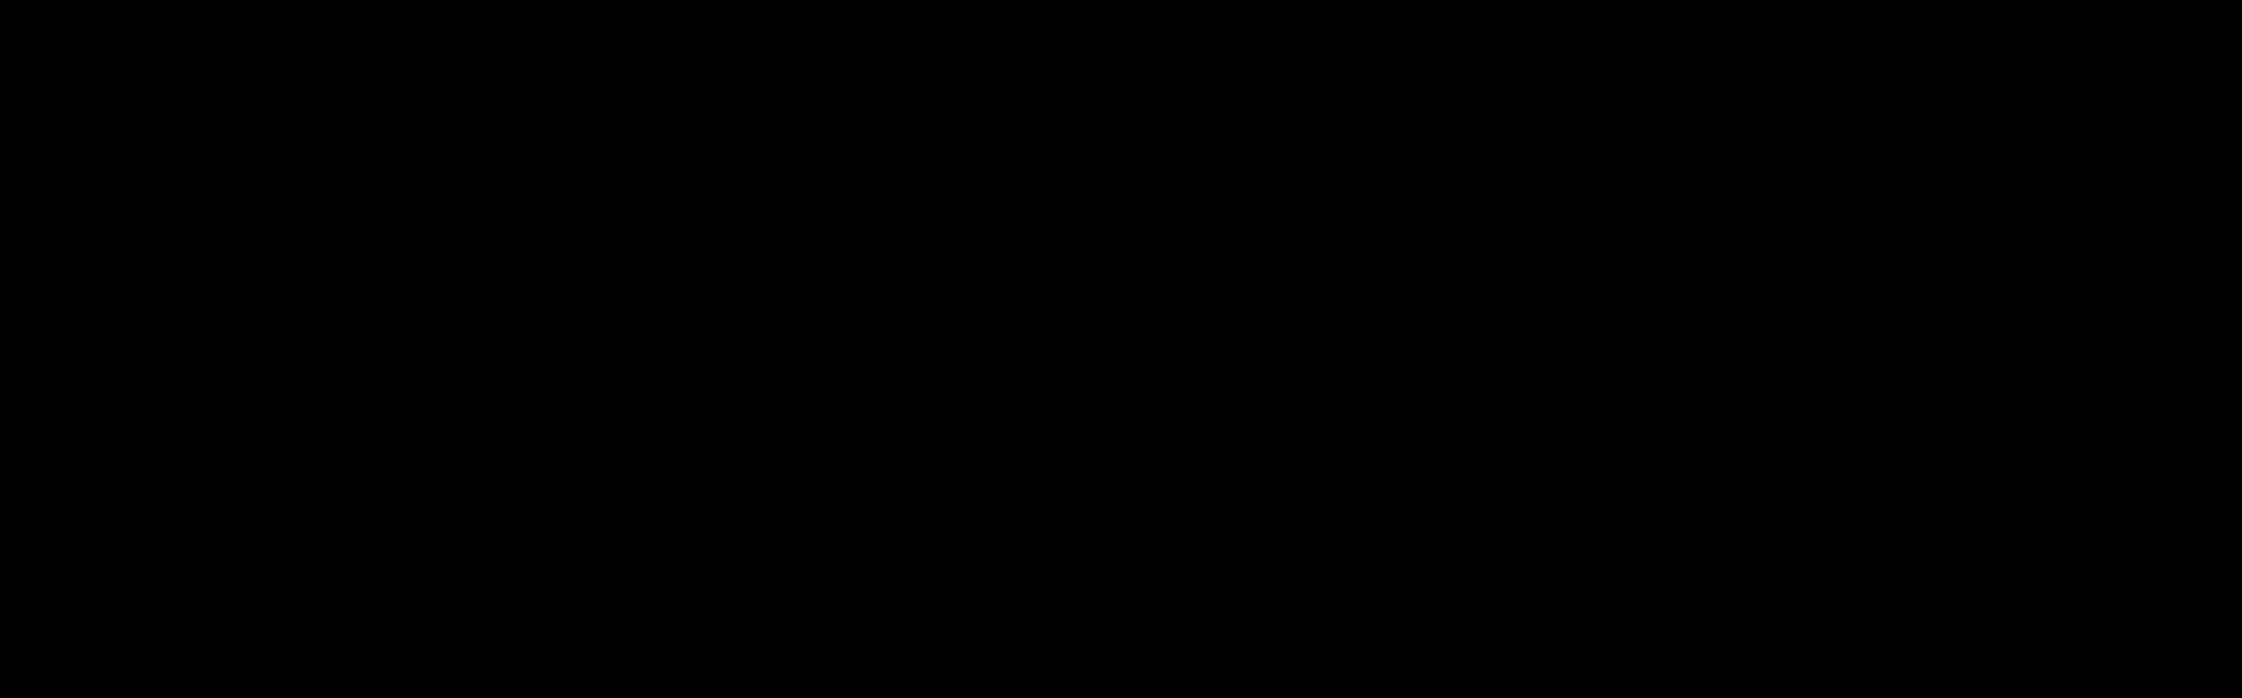 The Super Smash Bros Series Super Smash Bros Logo Super Smash Bros Smash Bros